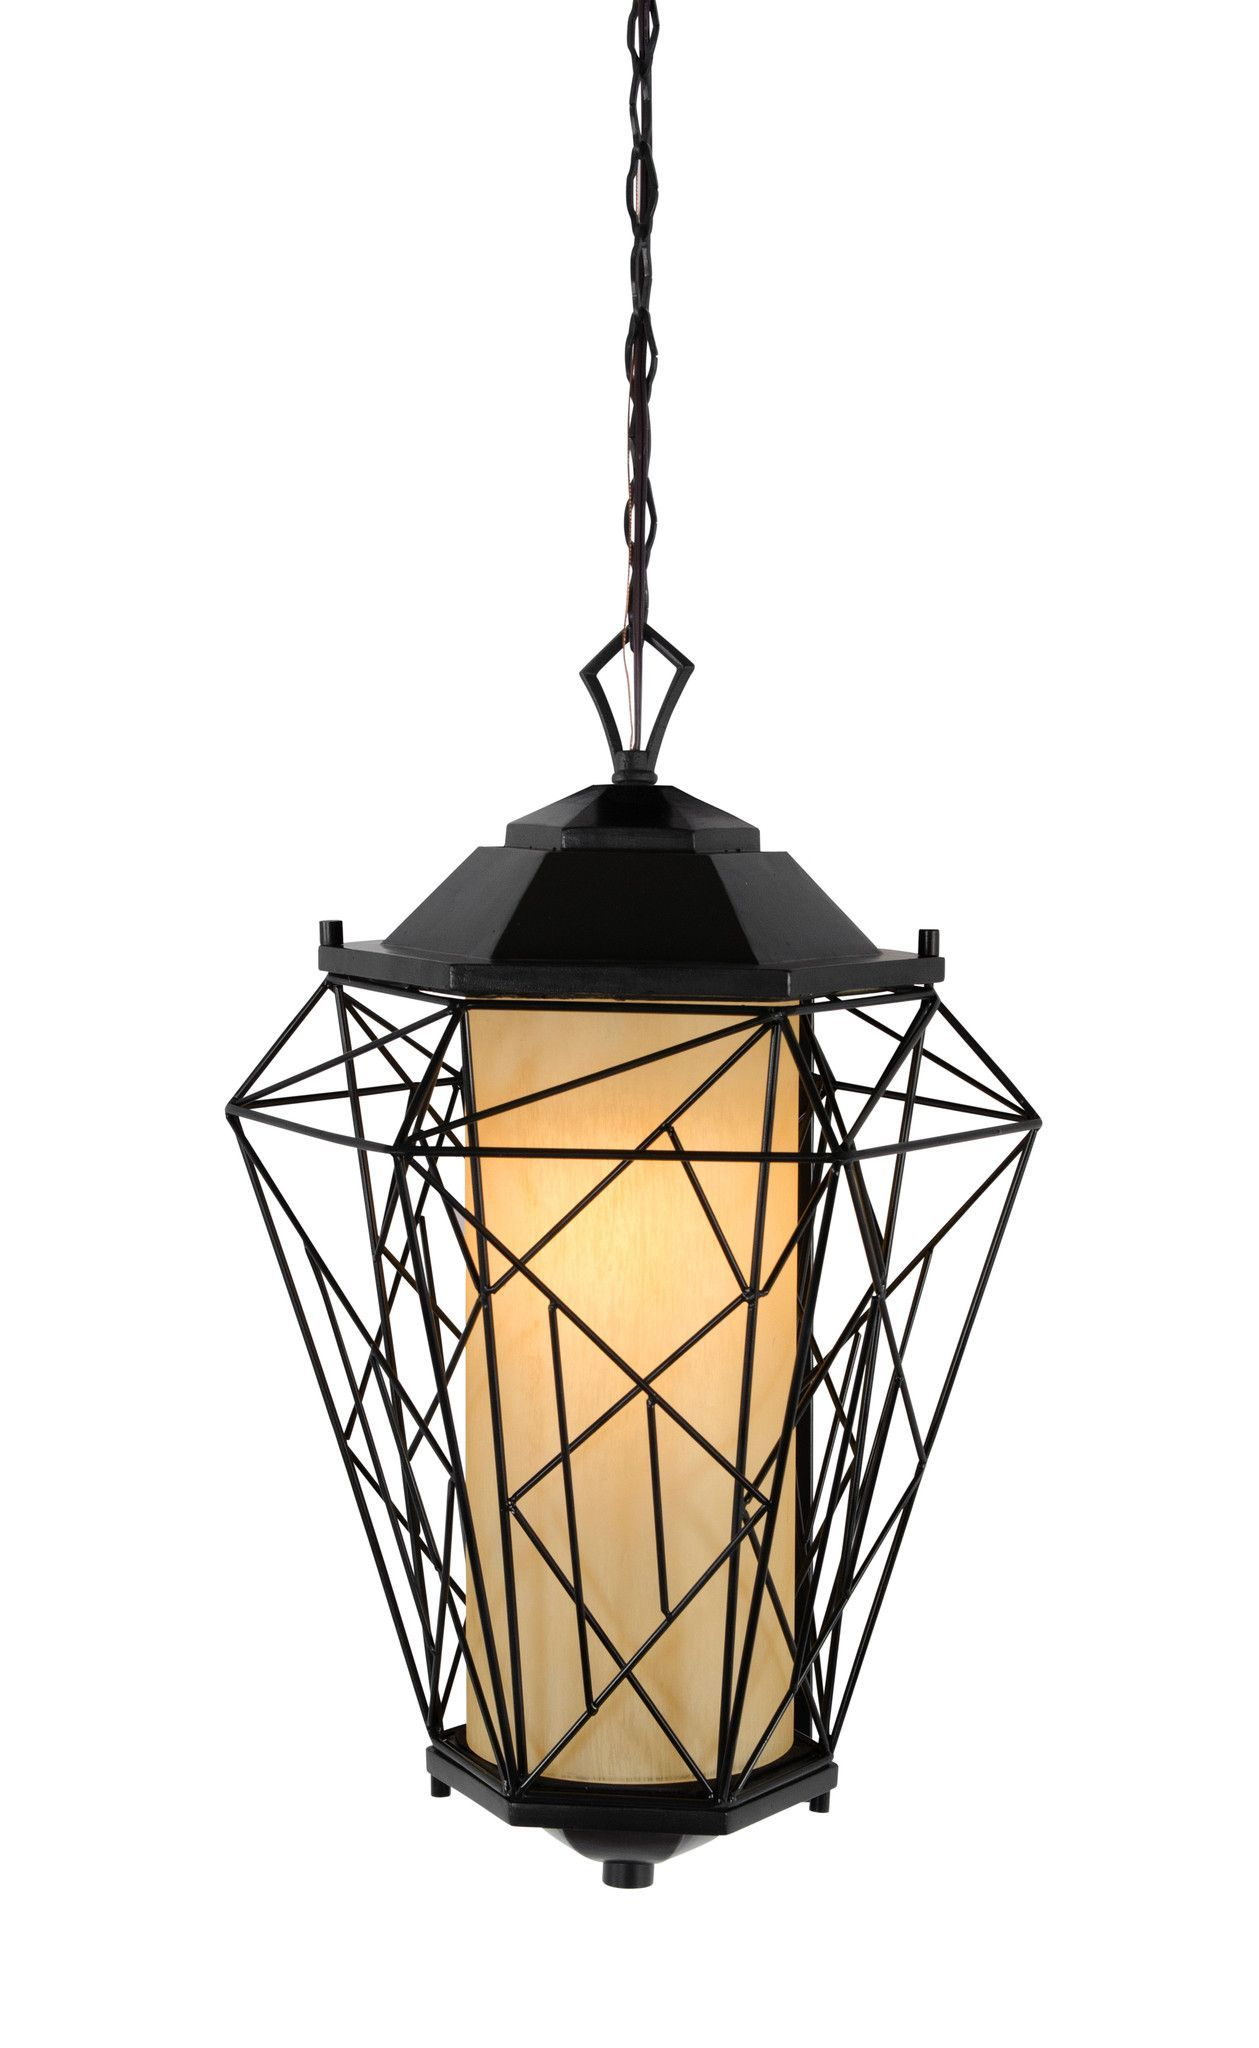 Wright Stuff 1 Light Pendant Outdoor Pendant Outdoor Hanging Lights Outdoor Pendant Lighting